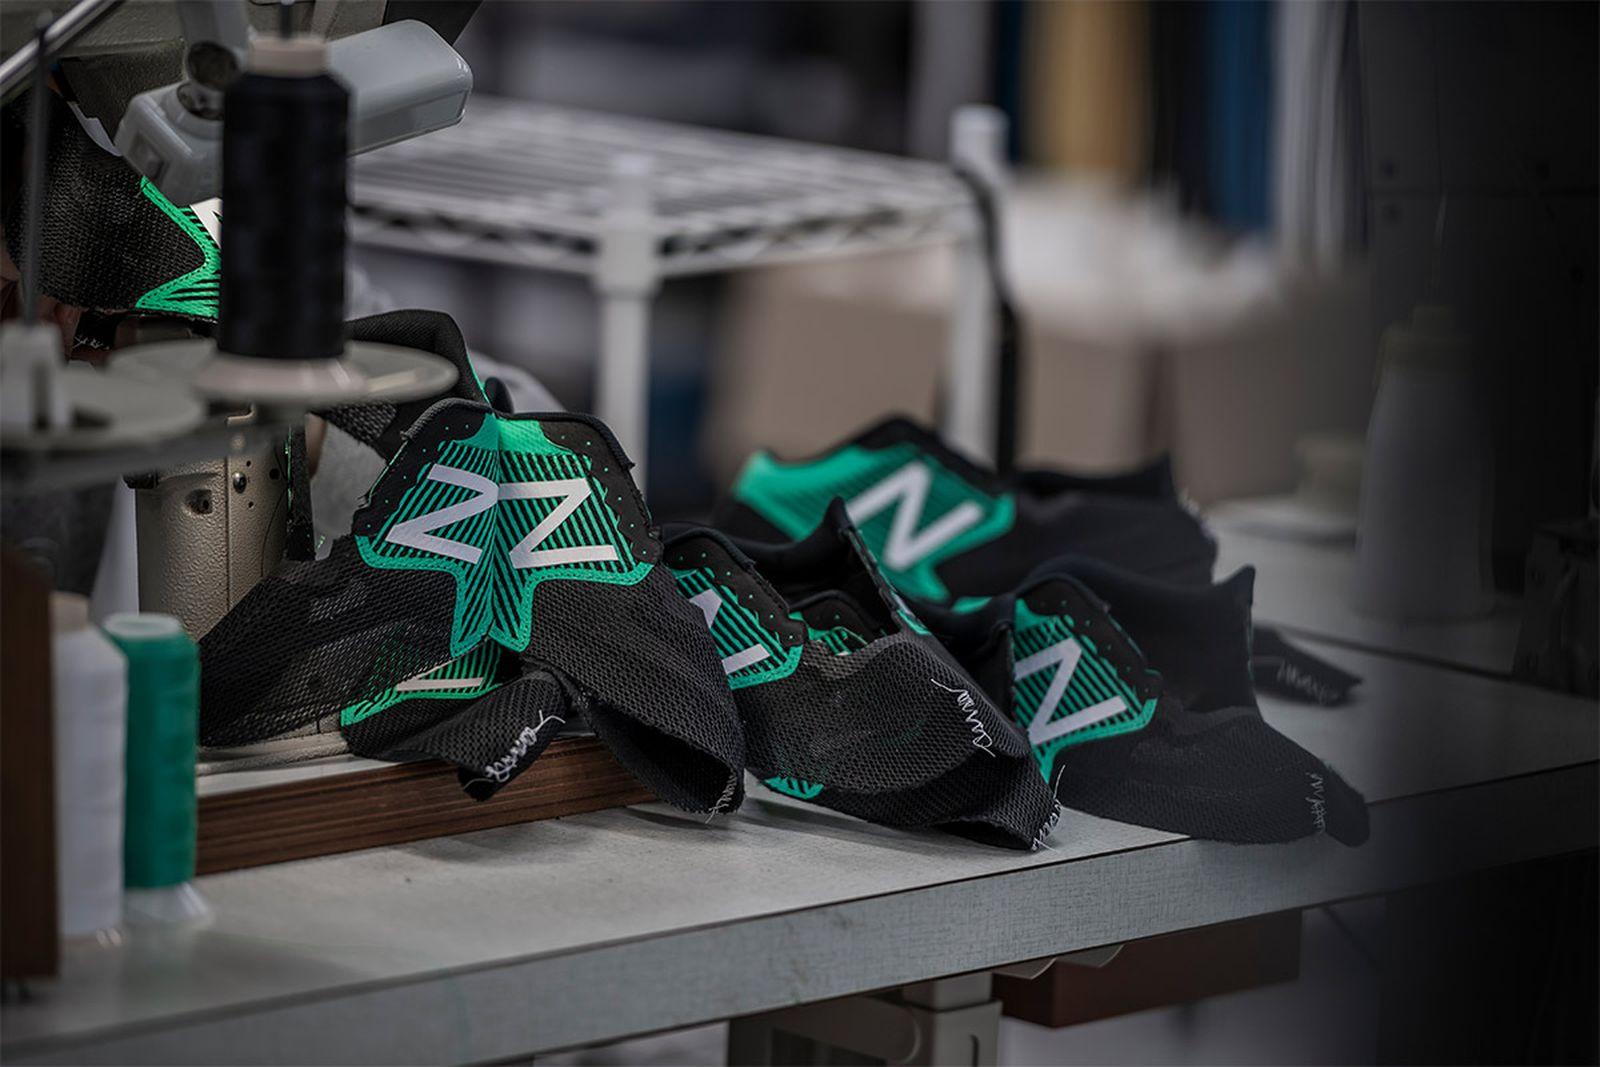 japans next great marathon runner got blessed god shoes02 New Balance running shoes